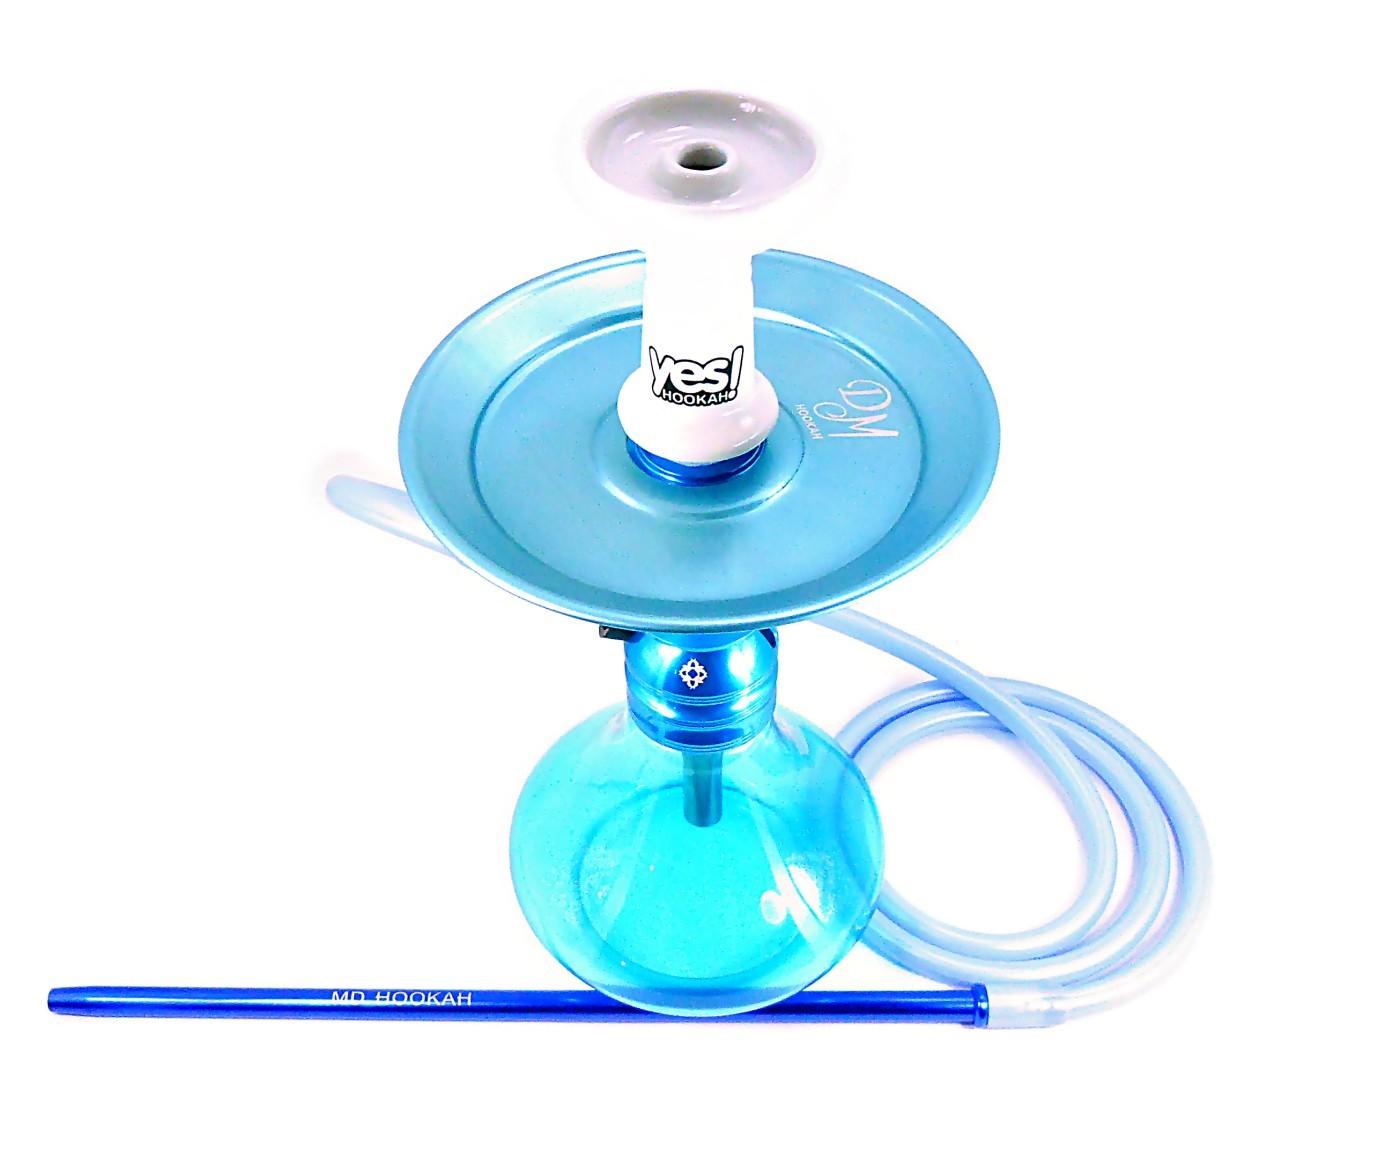 Narguile Amazon Kombat Azul, vaso Yes Aladin, mangueira silicone, piteira alumínio, rosh Yes Branco, prato DM azul